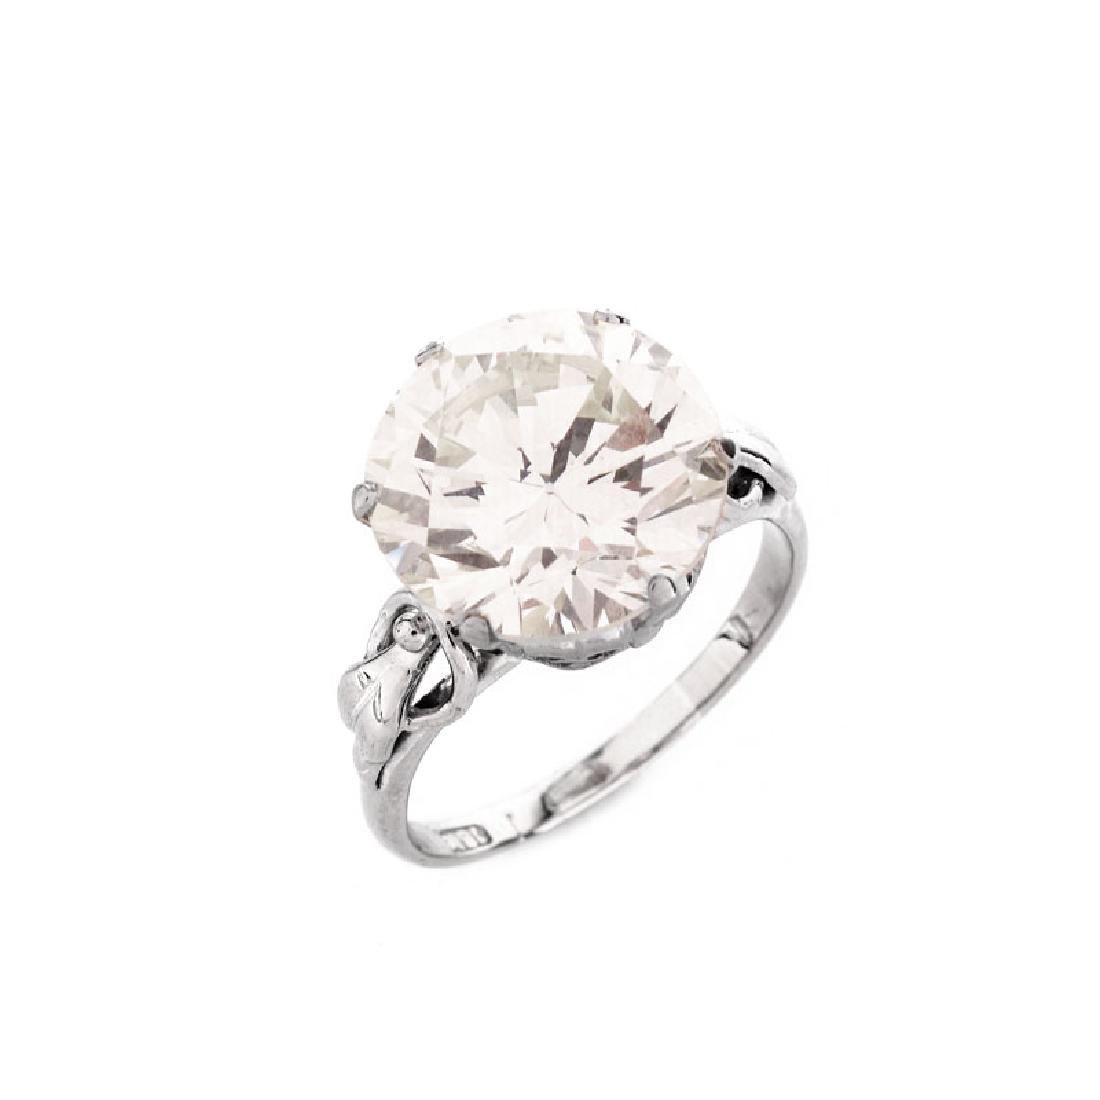 GIA Certified 9.44 Carat Round Brilliant Cut Diamond